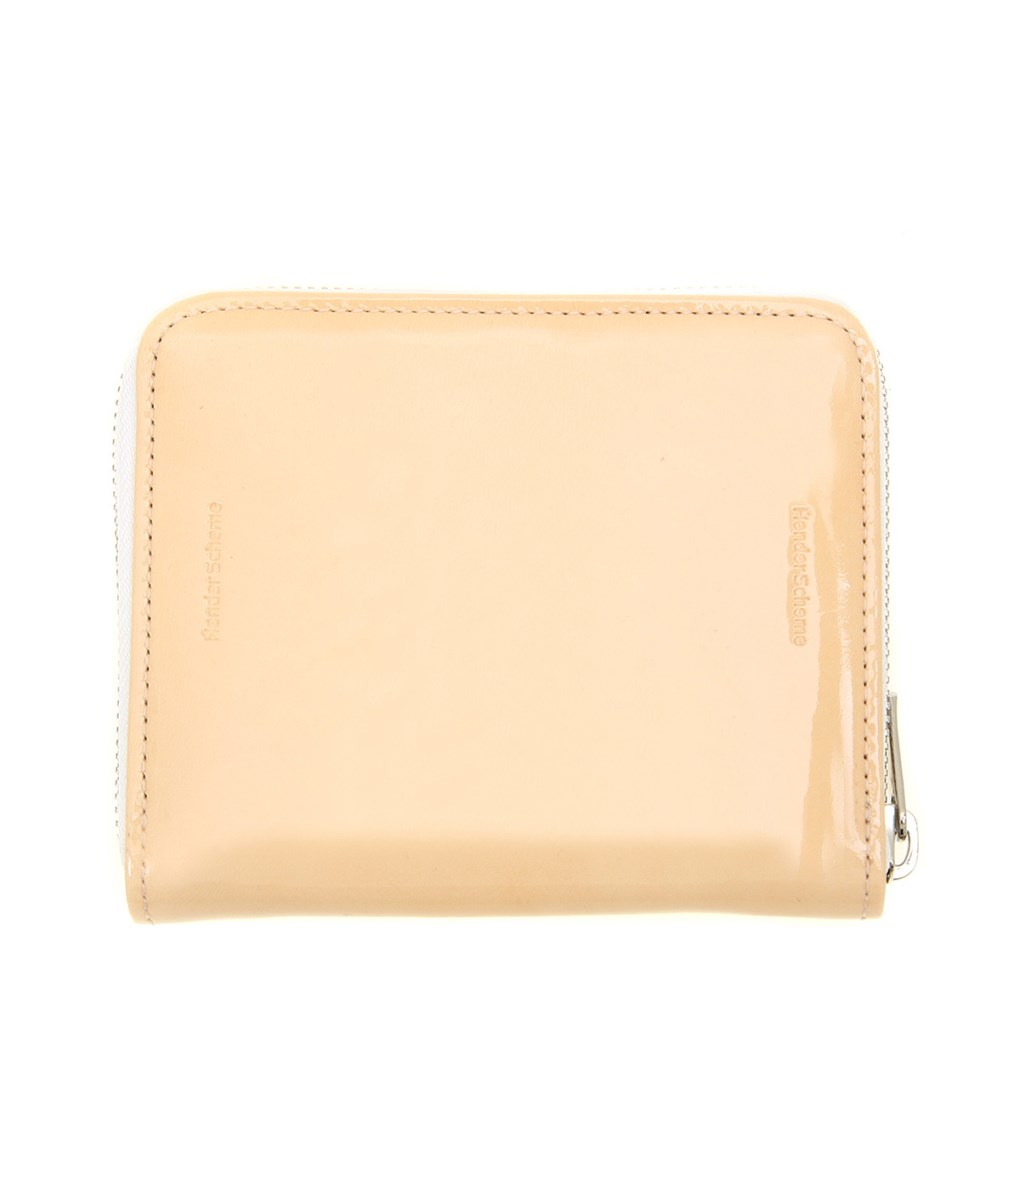 Hender Scheme / エンダースキーマ : square zip purse -patent natural- : スクエア ポーズ レザー ウォレット 財布 長財布 革小物 : fl-rc-szp 【RIP】【ANN】